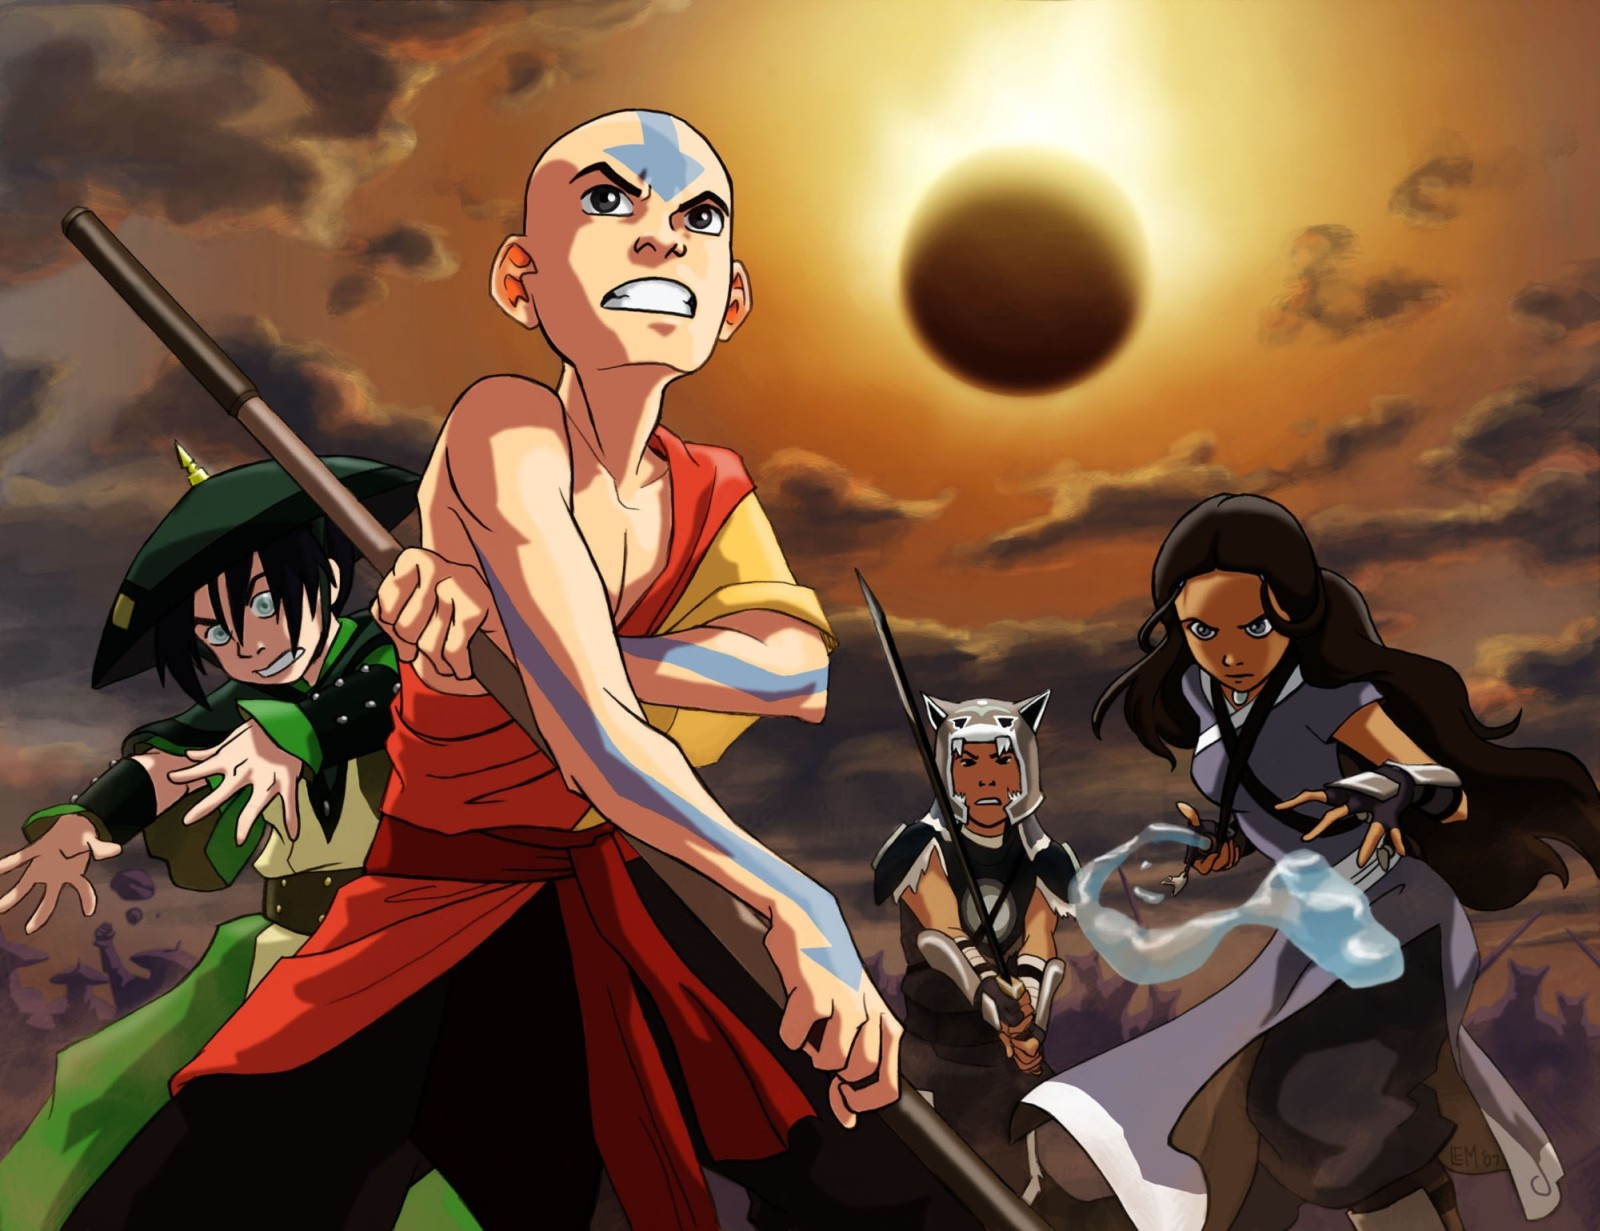 Аватар: Легенда об Аанге - книга первая: Вода / Avatar: The Last Airbender